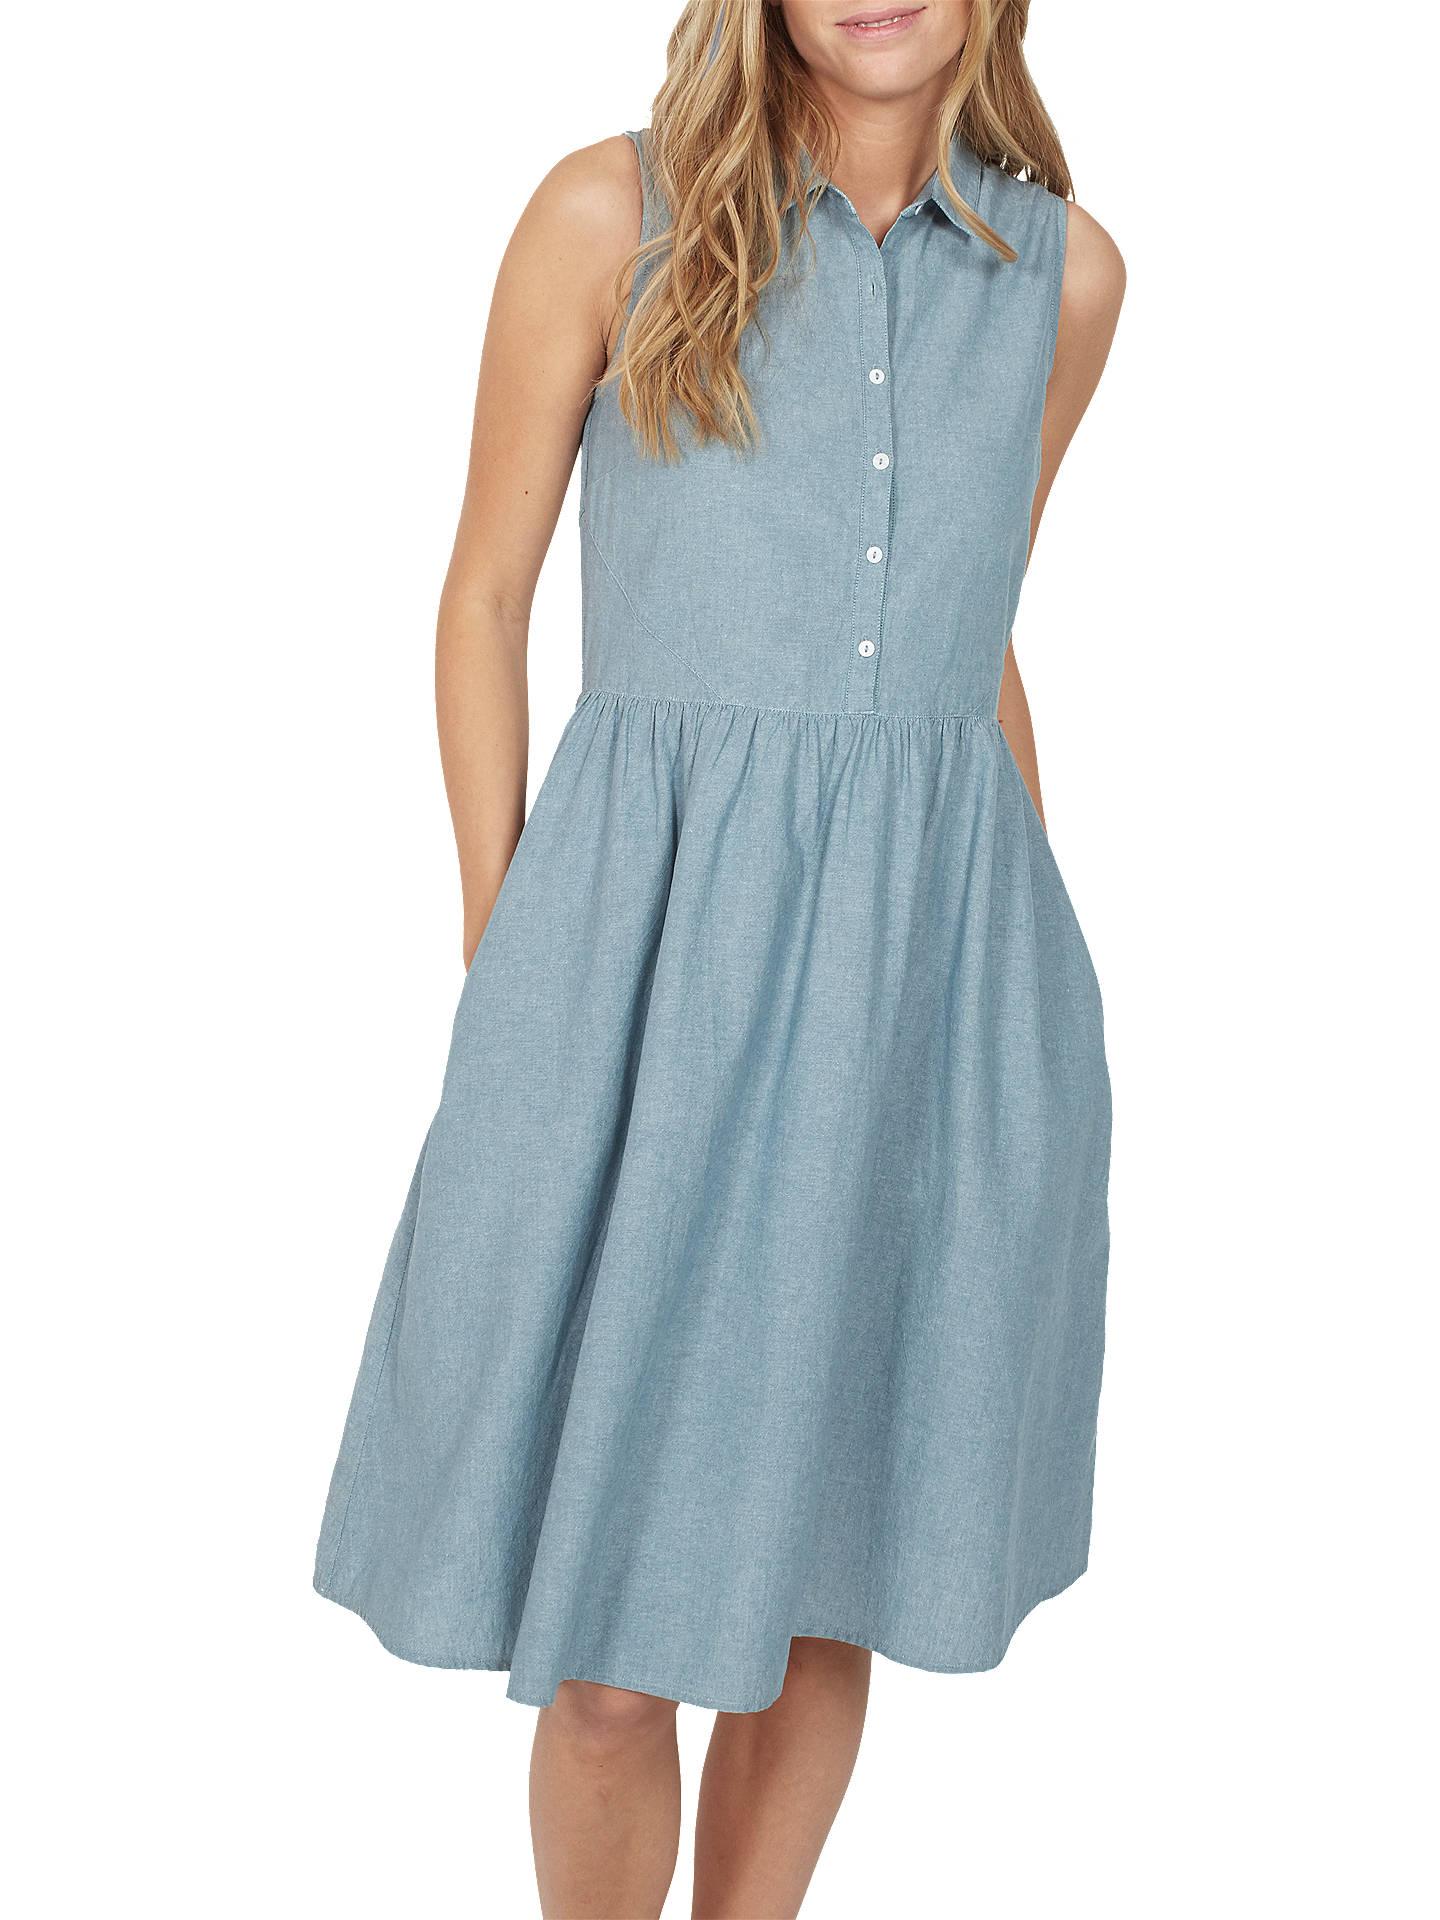 Festival Next Denim Chambray Pure Cotton Dress Dark Blue Garden Party Sz 14 100% High Quality Materials